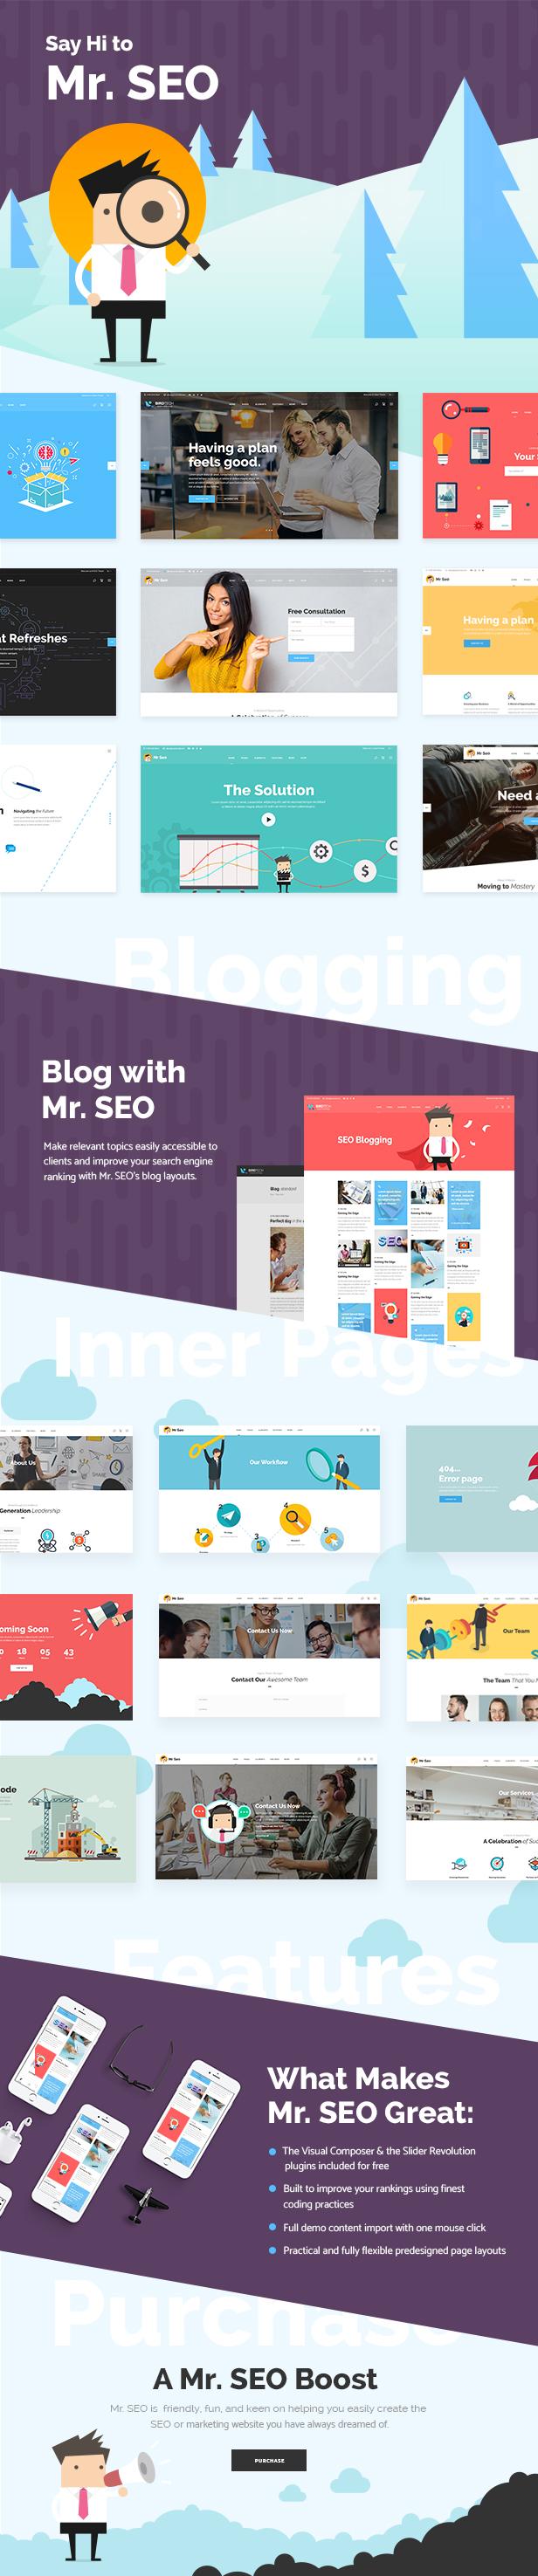 Mr. SEO - Thema der Social Media Marketing Agency - 1